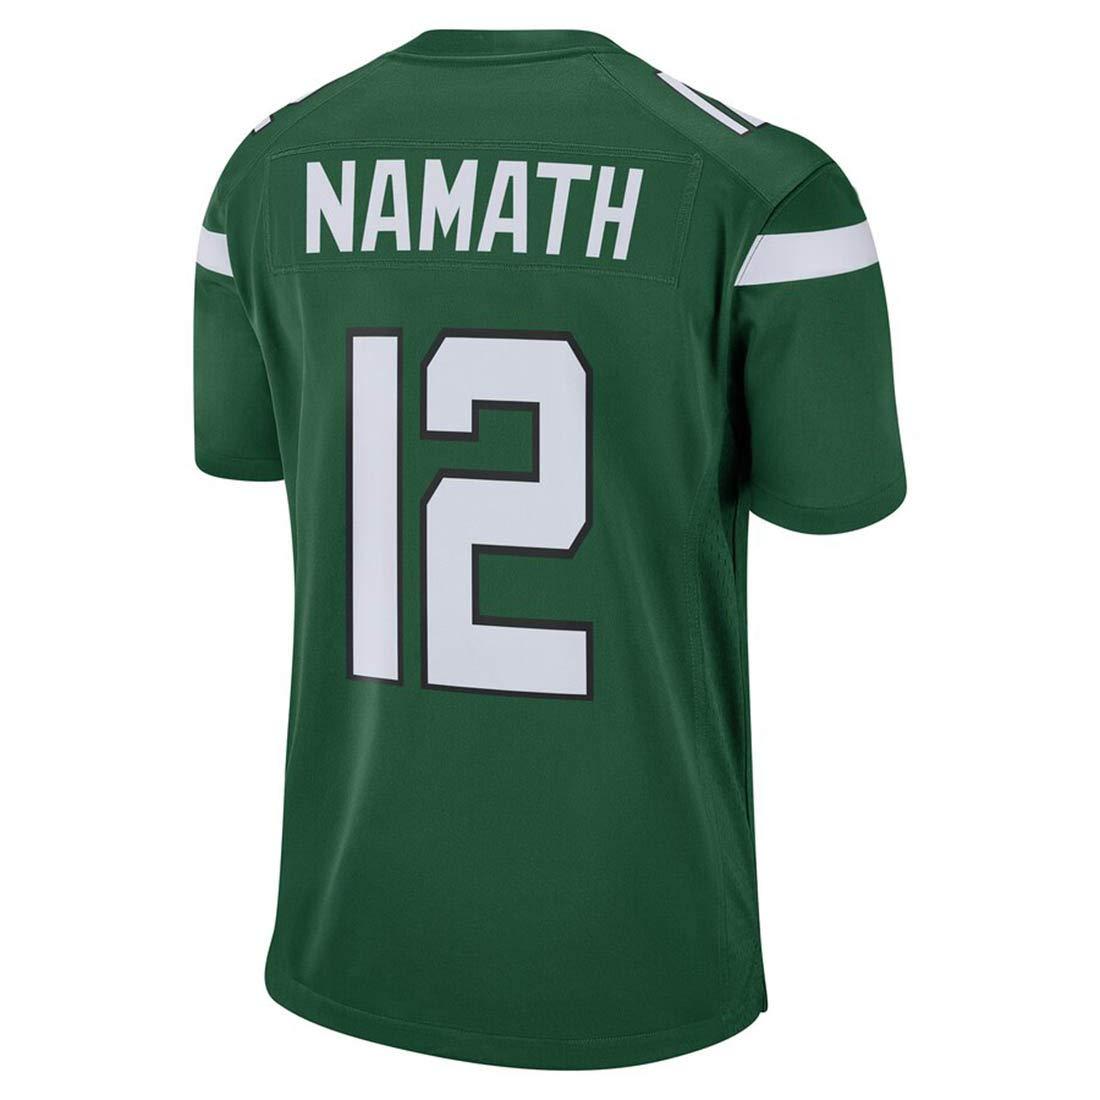 Womens//Mens/_Joe/_Namath/_Green/_Jersey/_Shirt